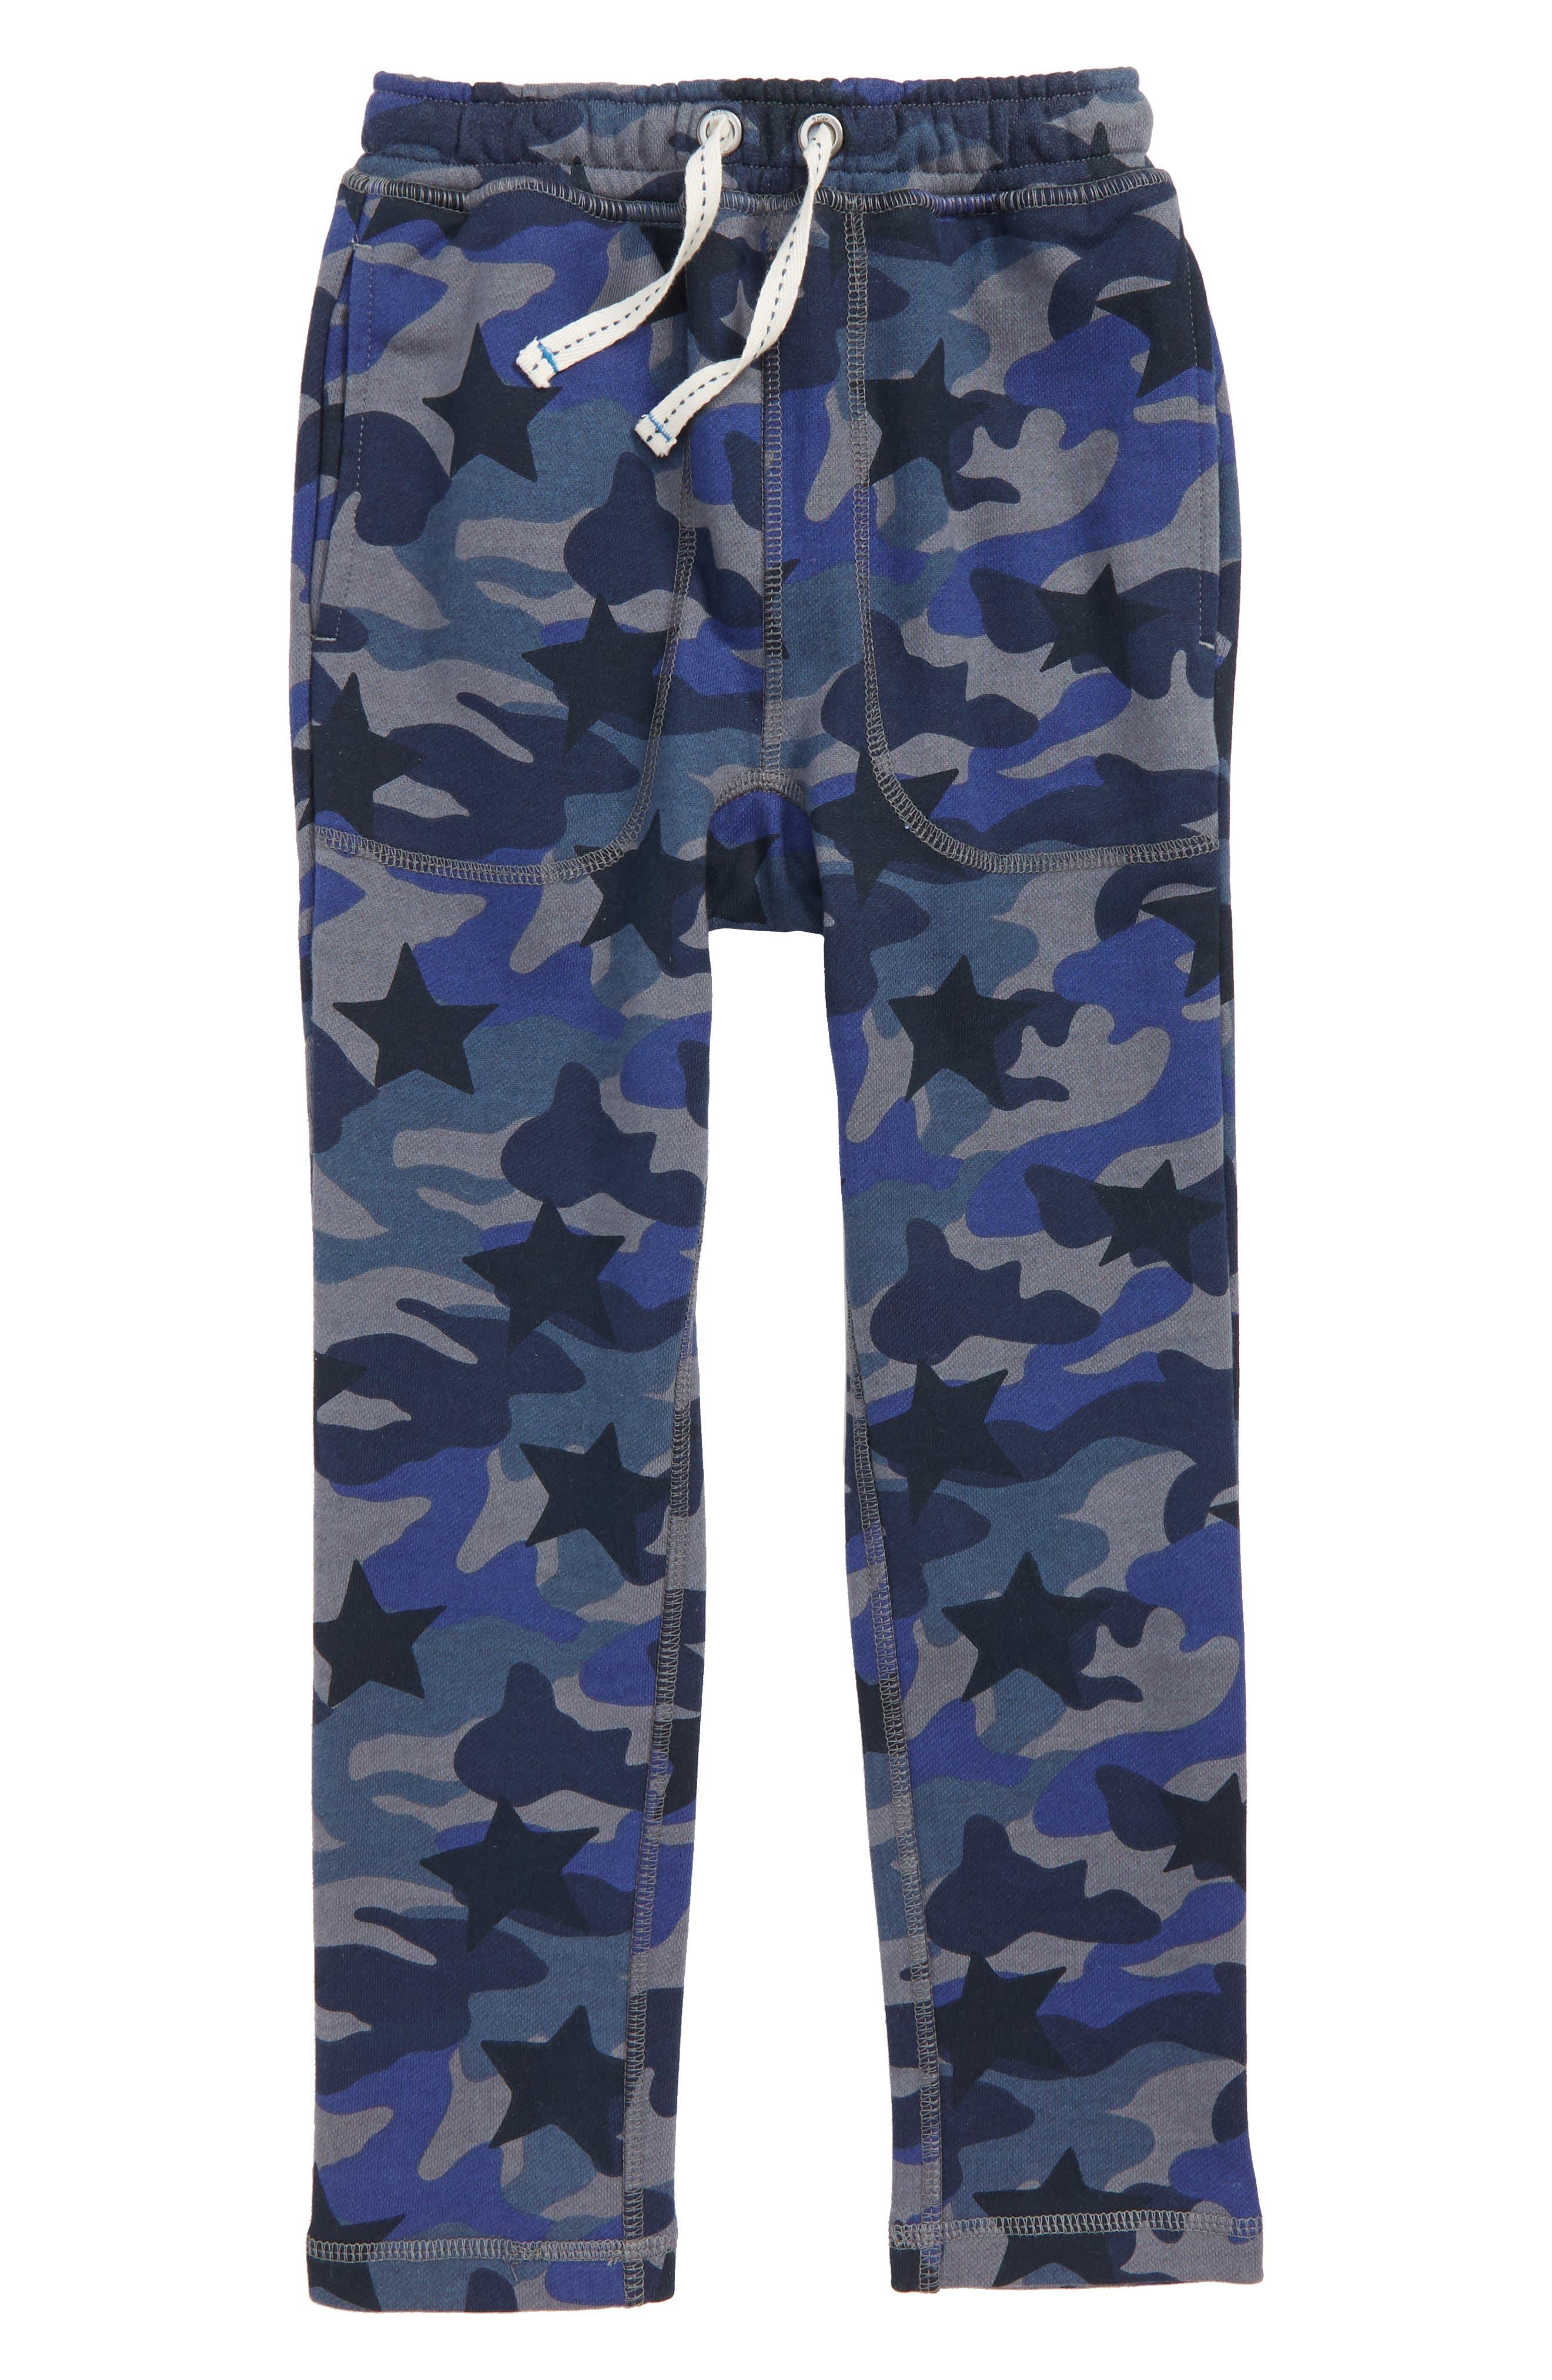 Slouch Sweatpants,                         Main,                         color, RAFT GREY CAMO STAR